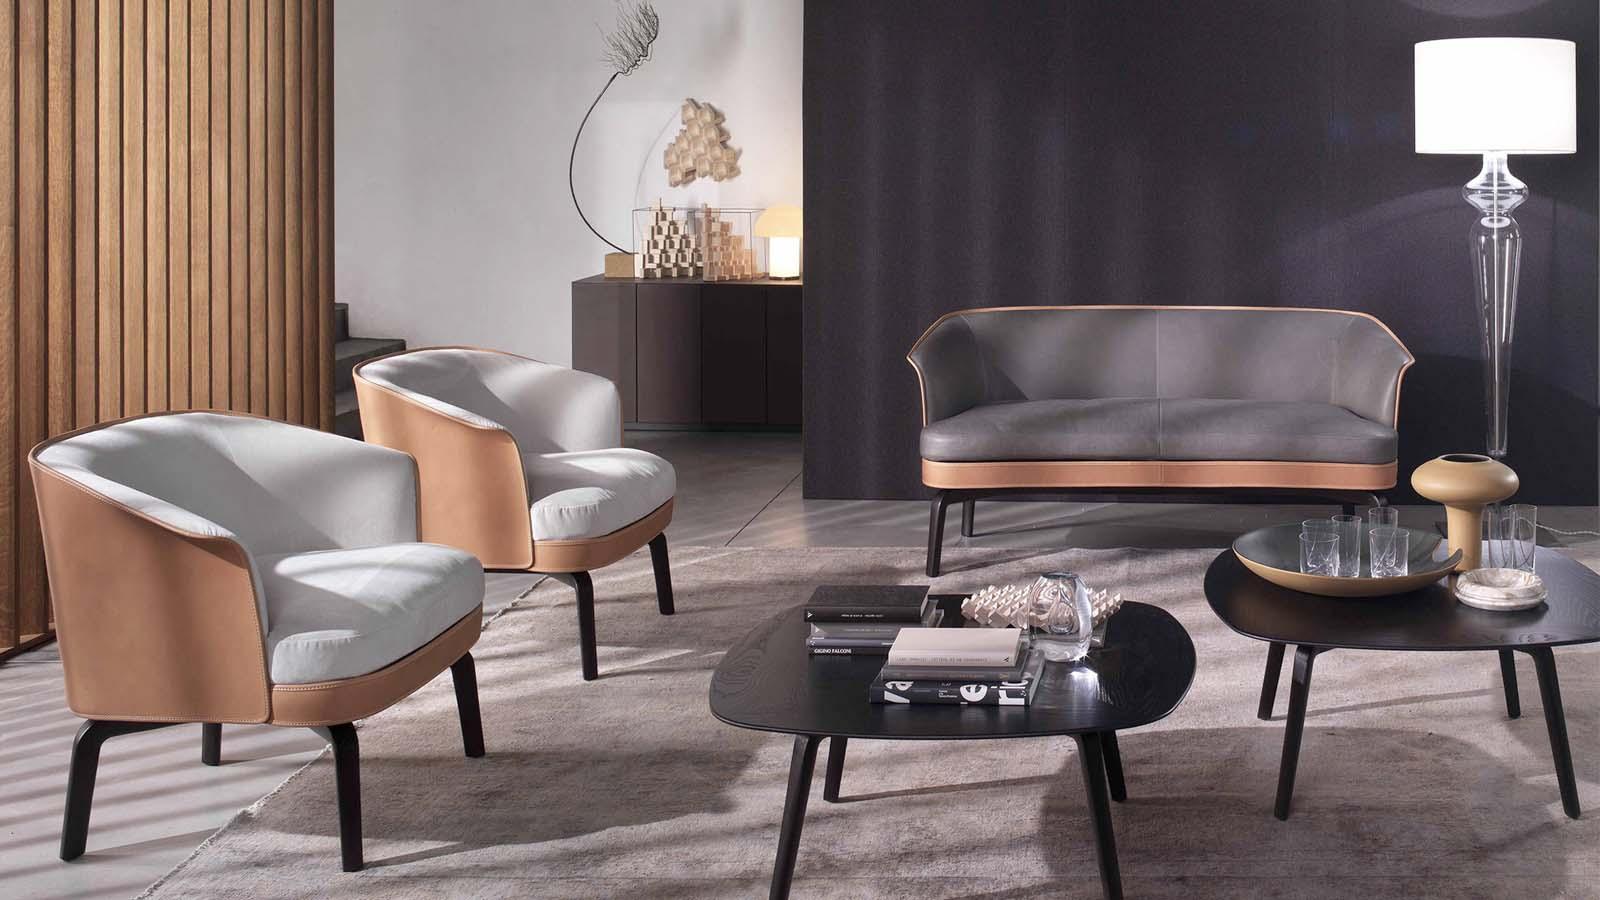 The design of Poltrona Frau Sofas and Armchairs   Sag80